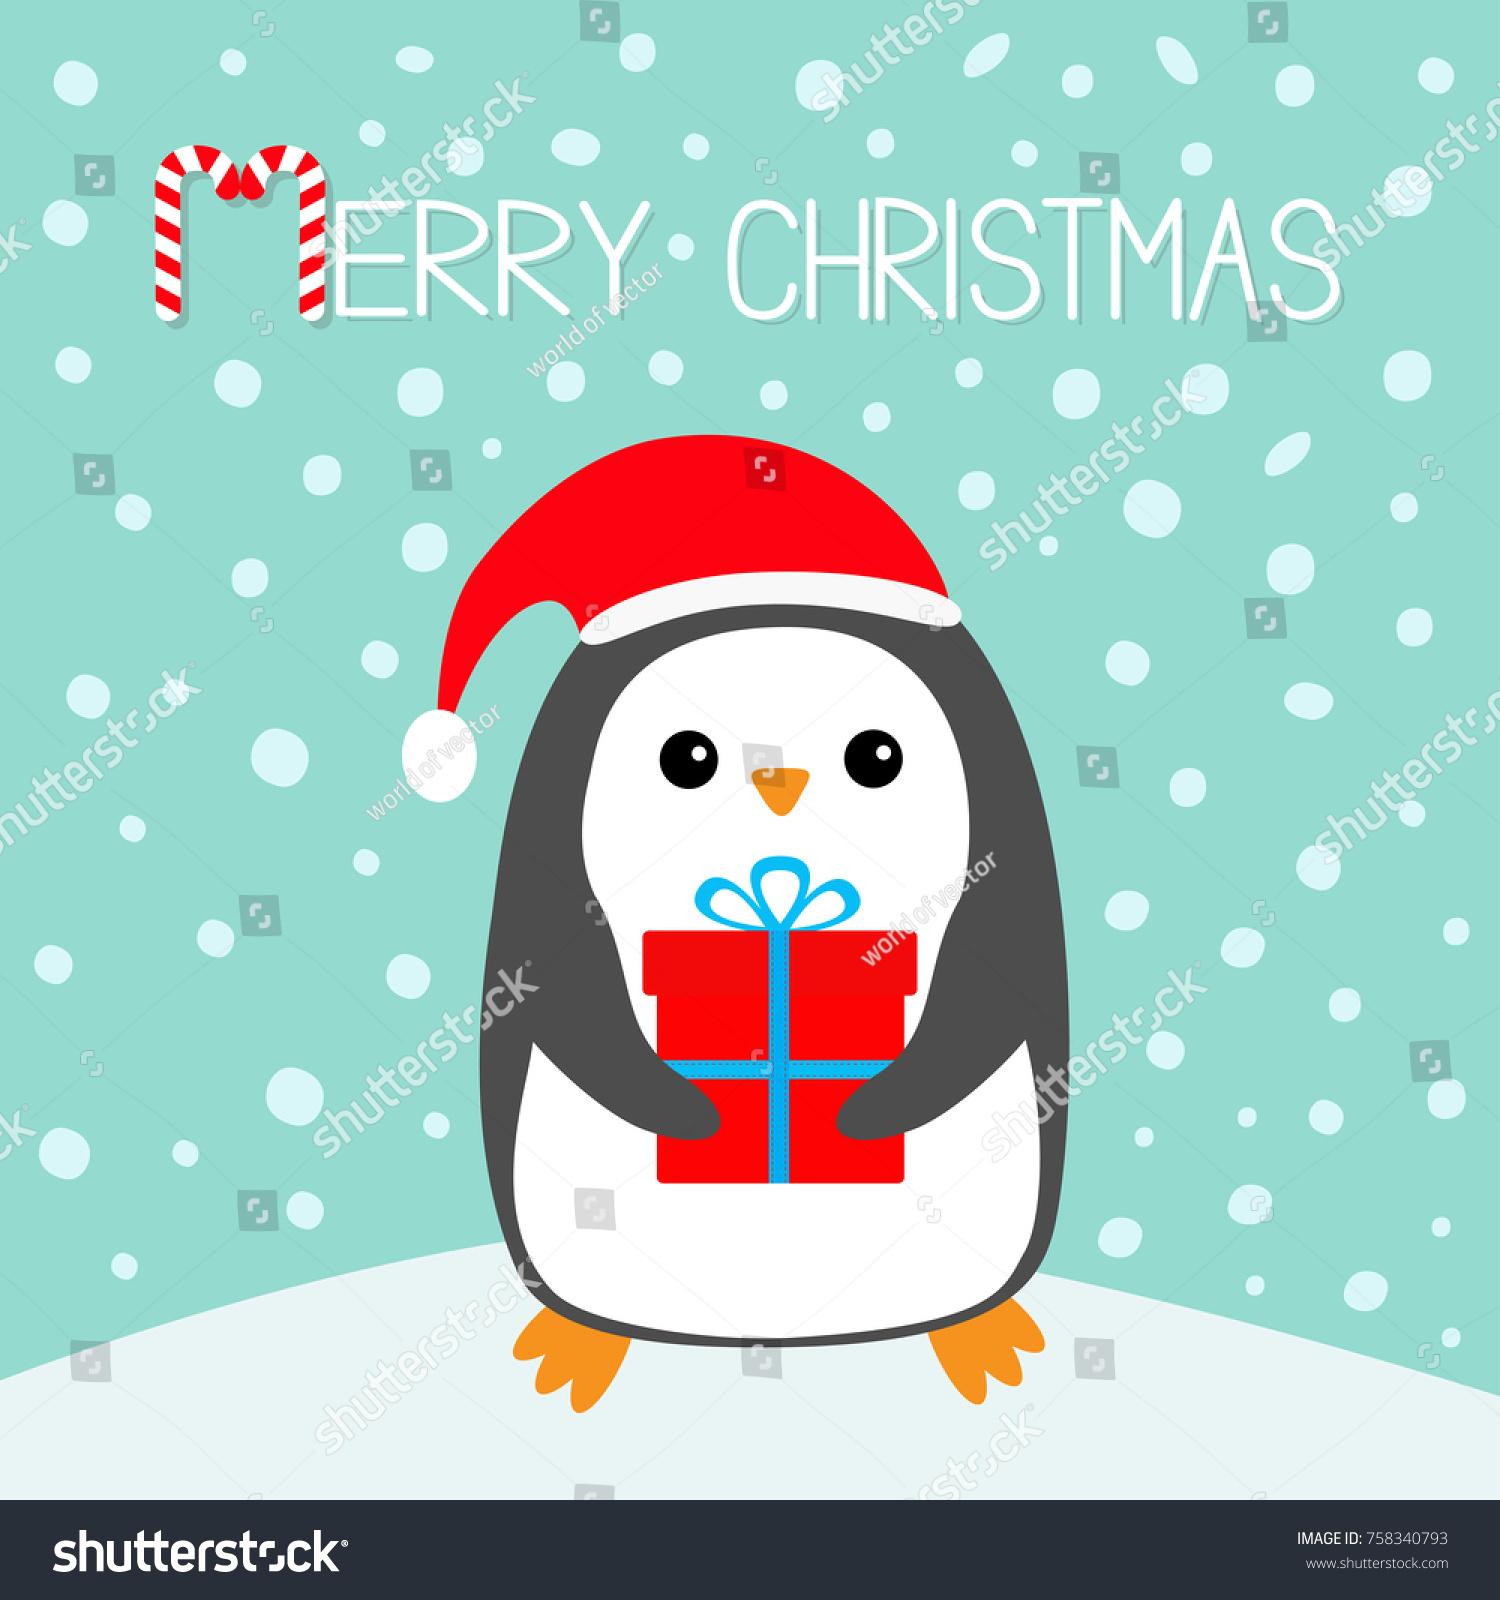 23e483a92221f Santa Claus red hat. Gift box. Cute cartoon kawaii funny animal character.  Flat design. Winter blue snow background. Greeting card Vector illustration  - ...